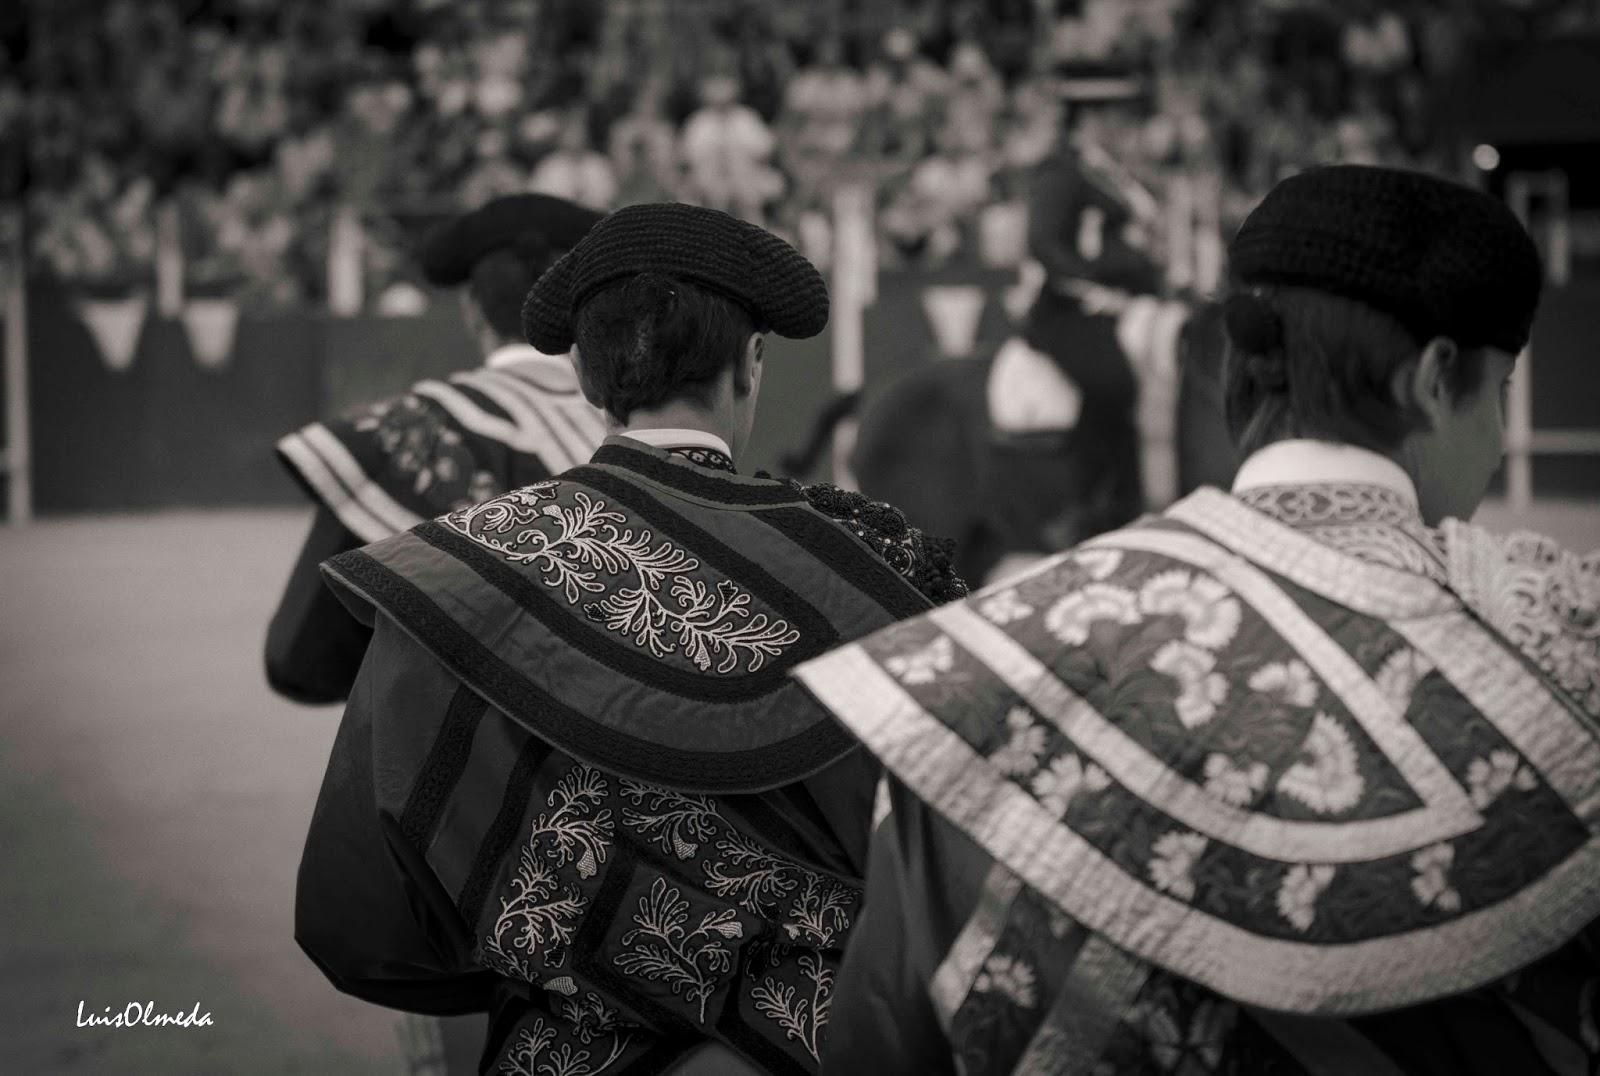 OlmedaPhoto&Taurus: Azuqueca de Henares 22 Septiembre 2017